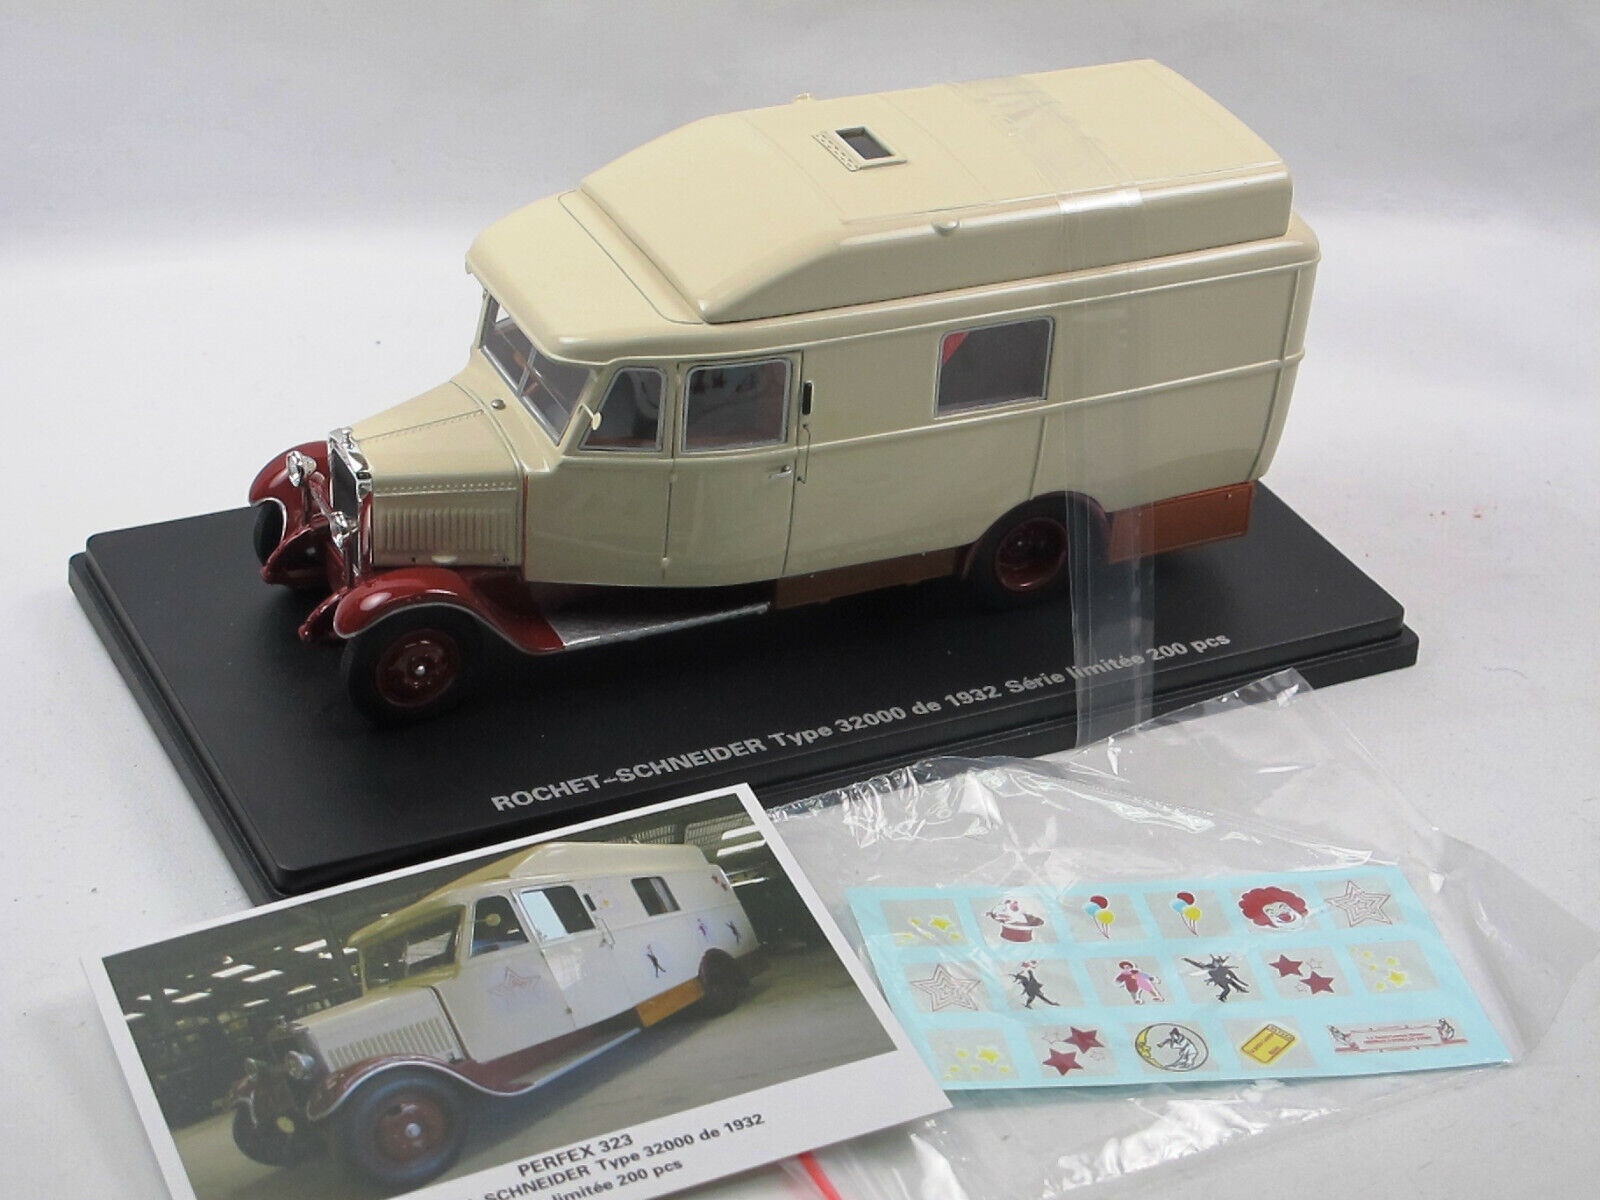 PERFEX 323 - 1932 ROCHET-SCHNEIDER type 32000 FORAIN Home-Car Camping-Car 1 43